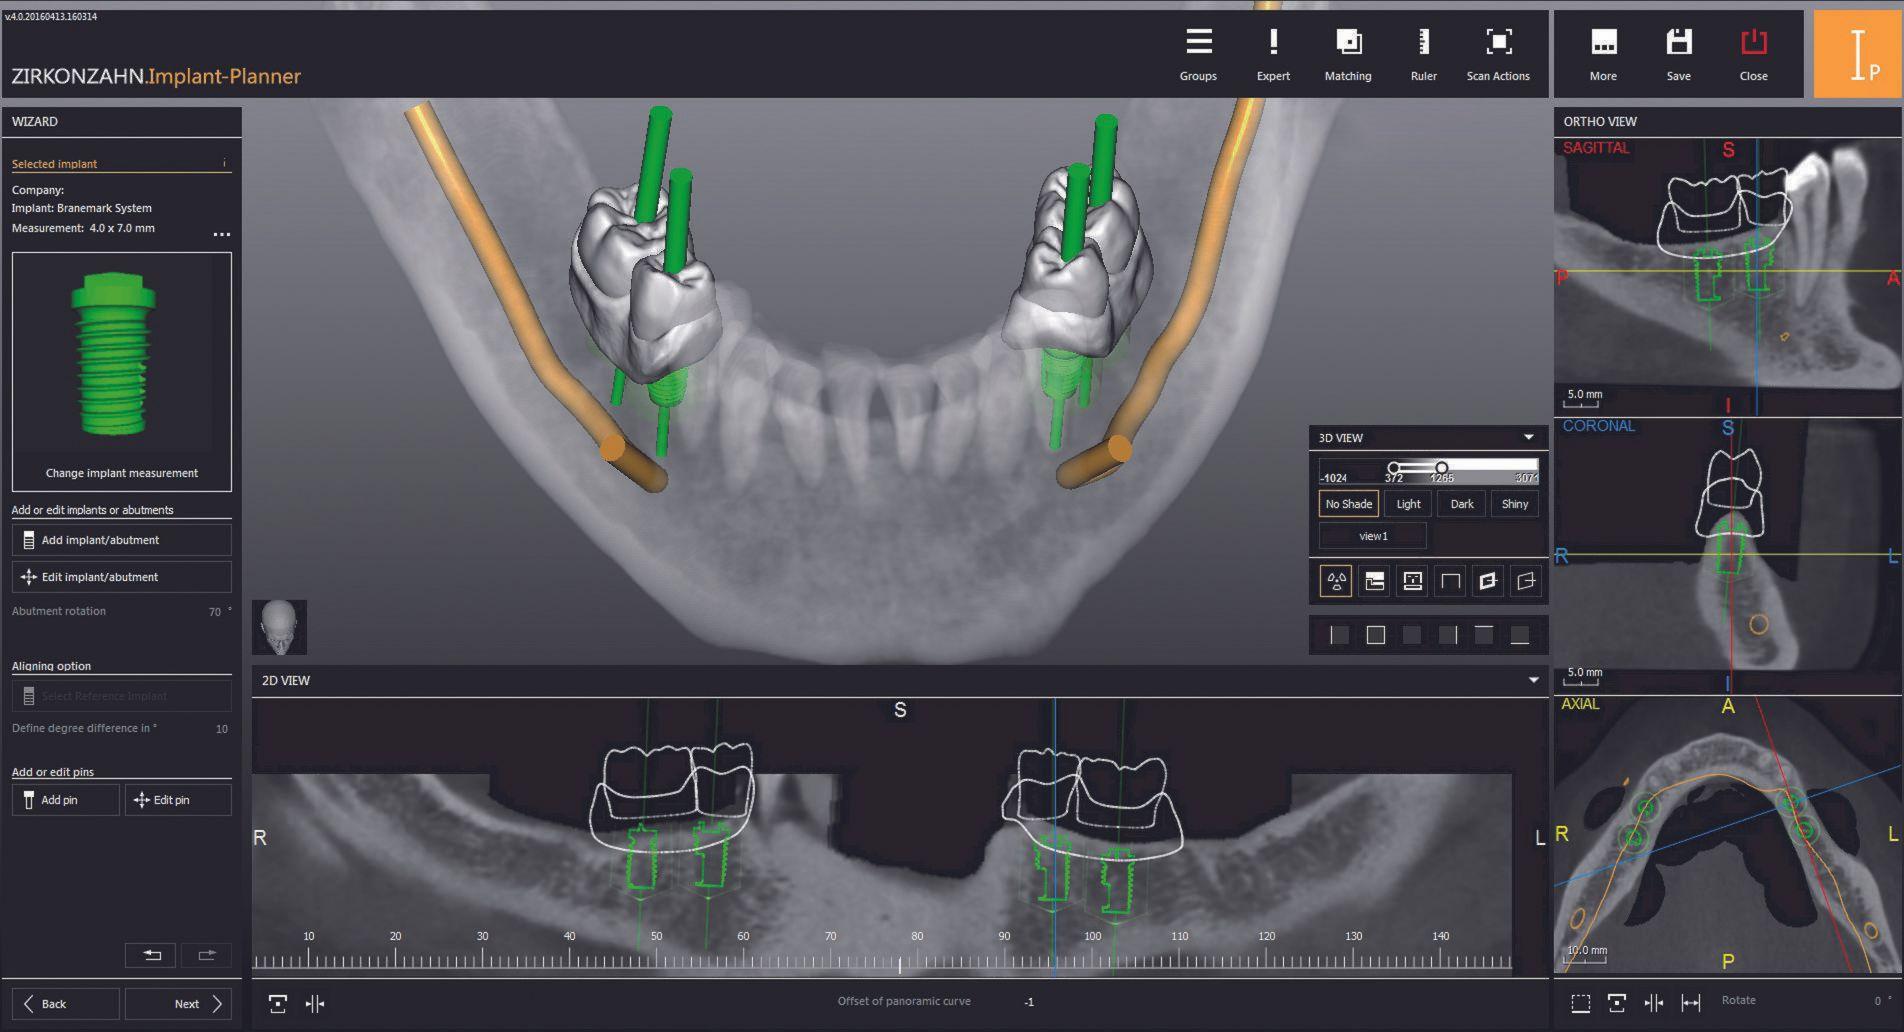 Safe planning in implant prosthetics